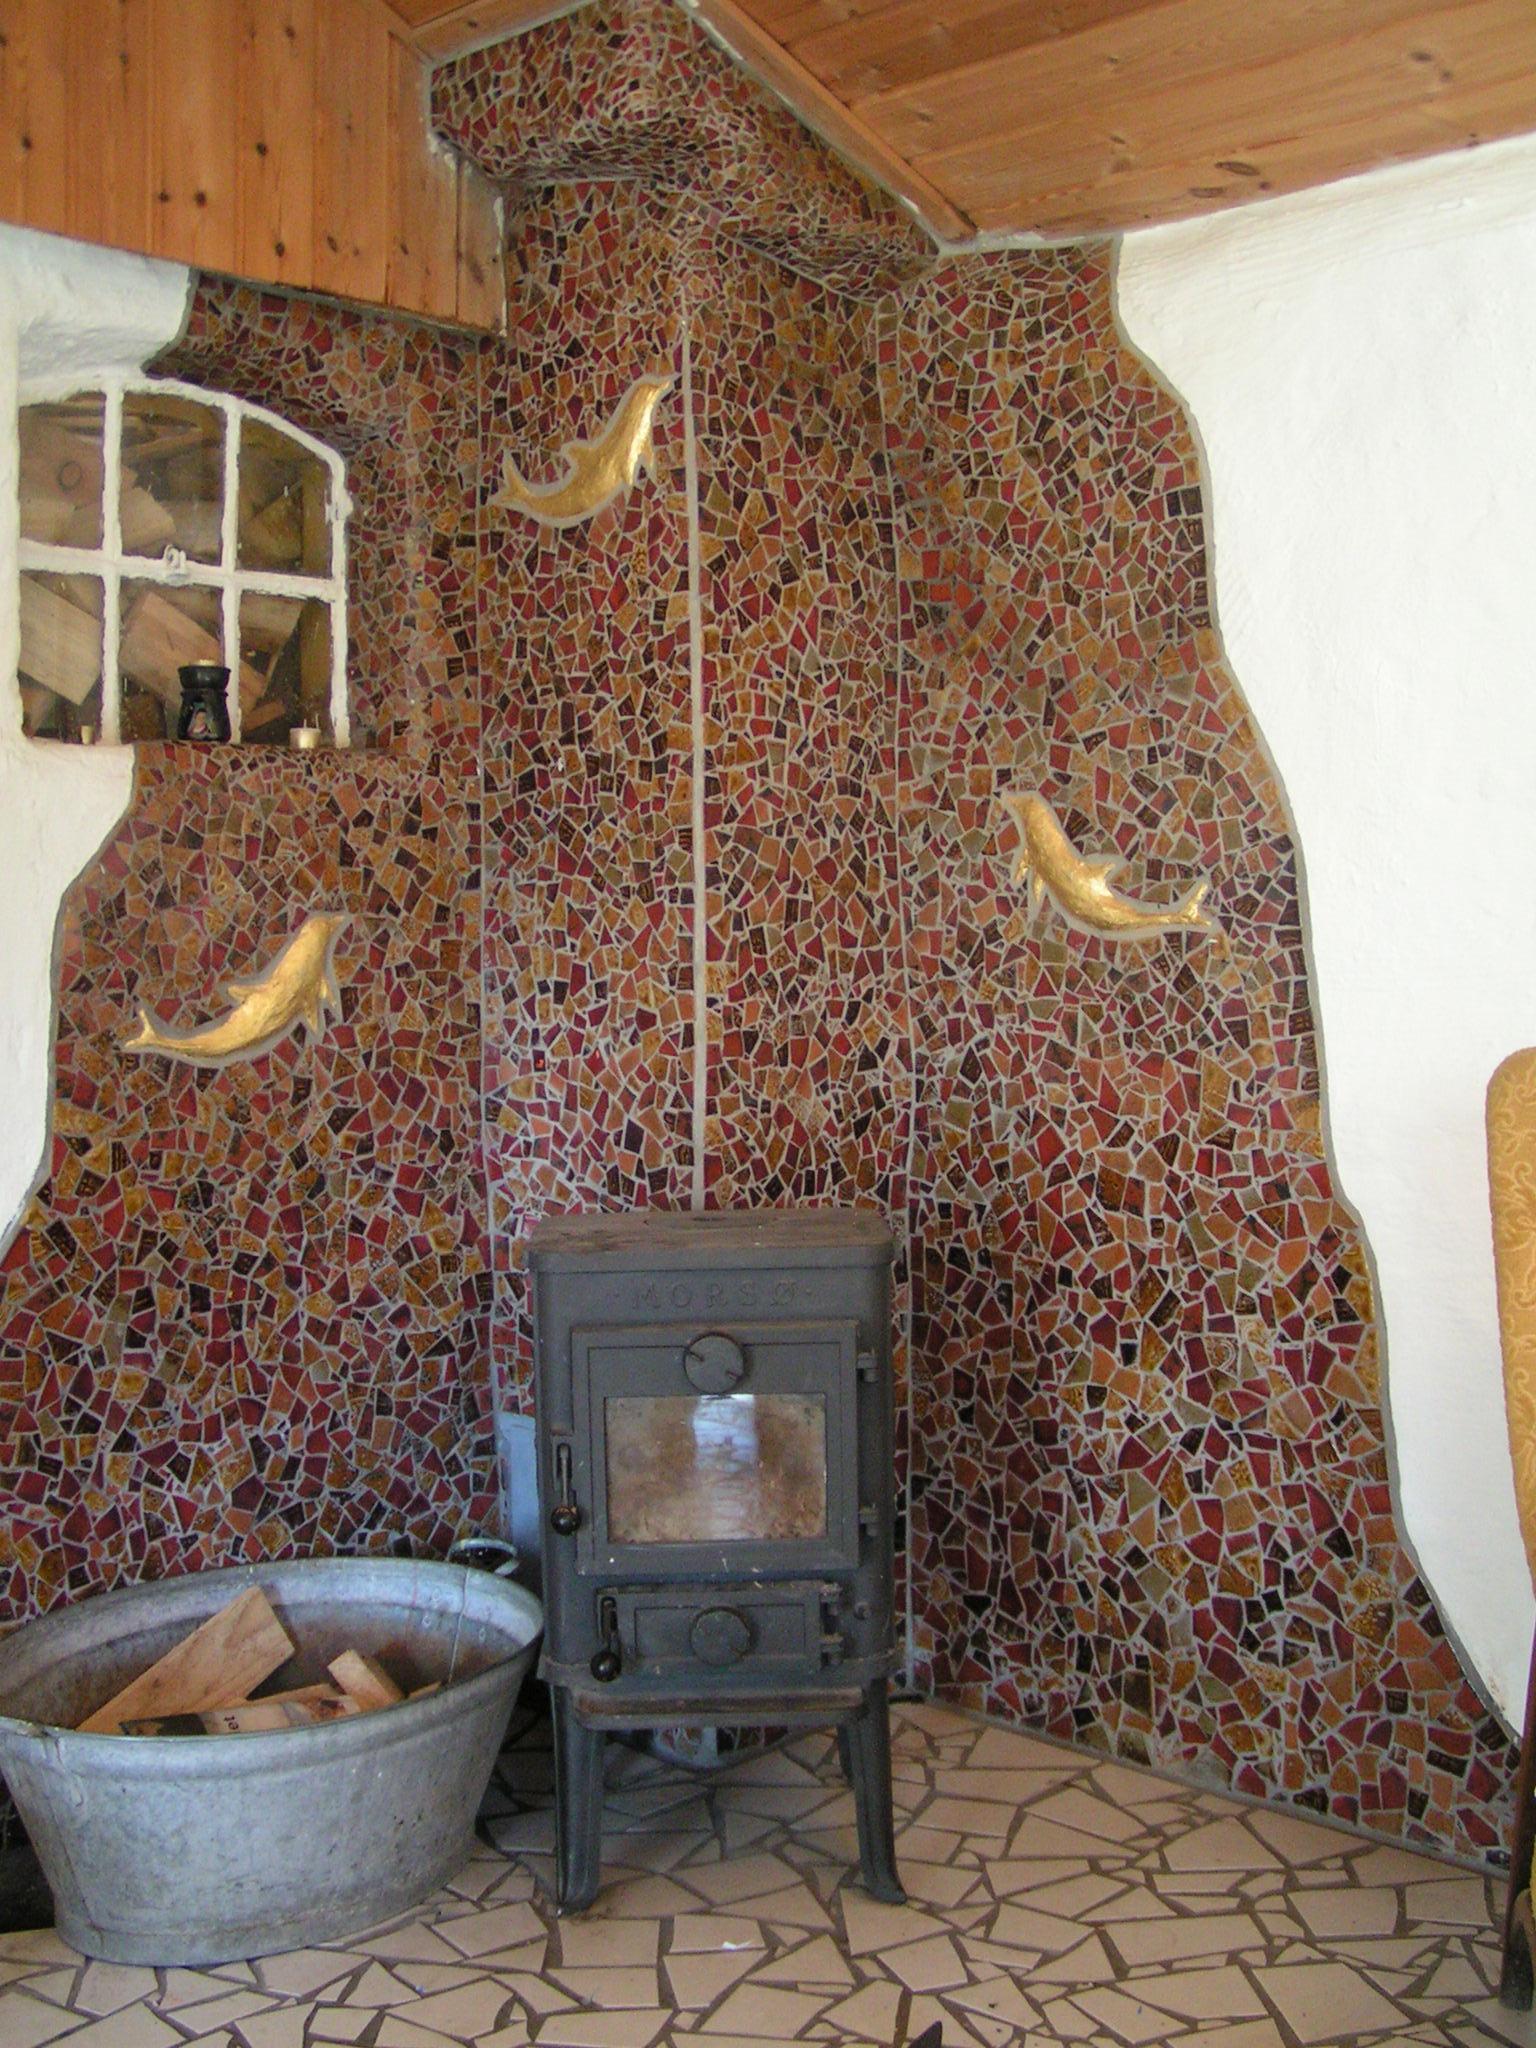 Mosaik udsmykning bag brændeovn - Mosaic wall decoration behind wood stove